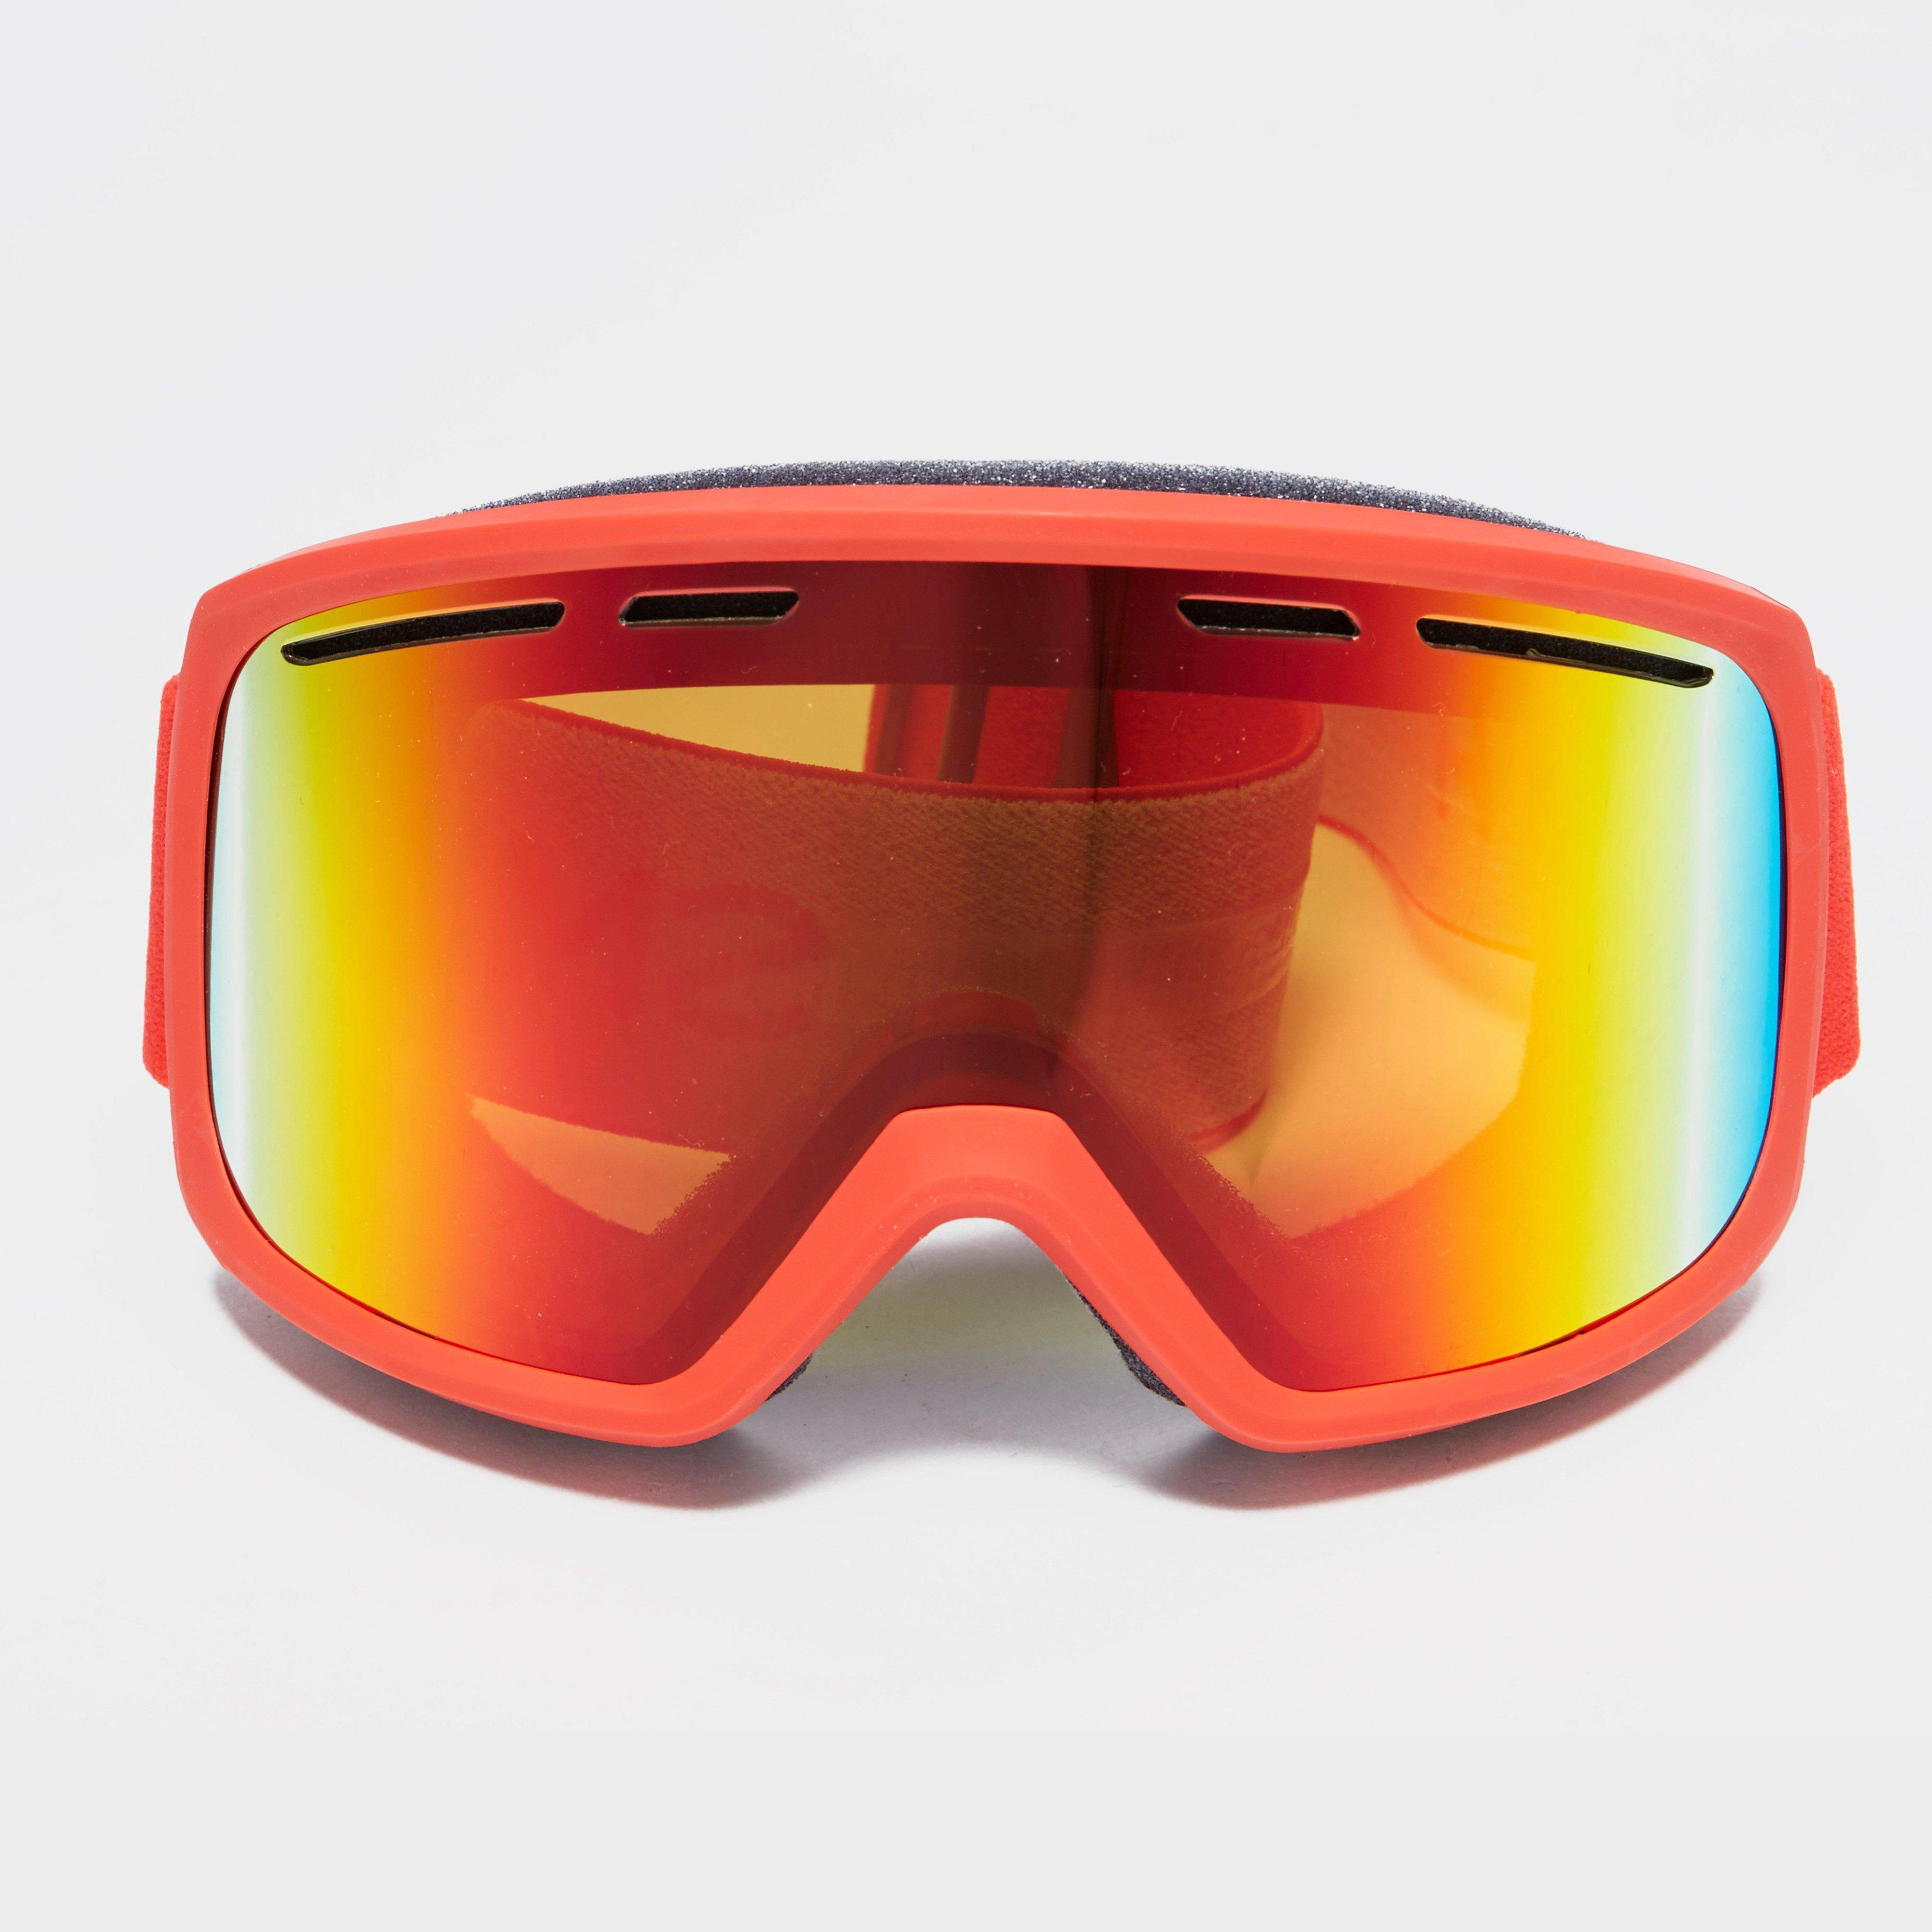 Smith Smith Mens Range Ski Goggles - Red, Red